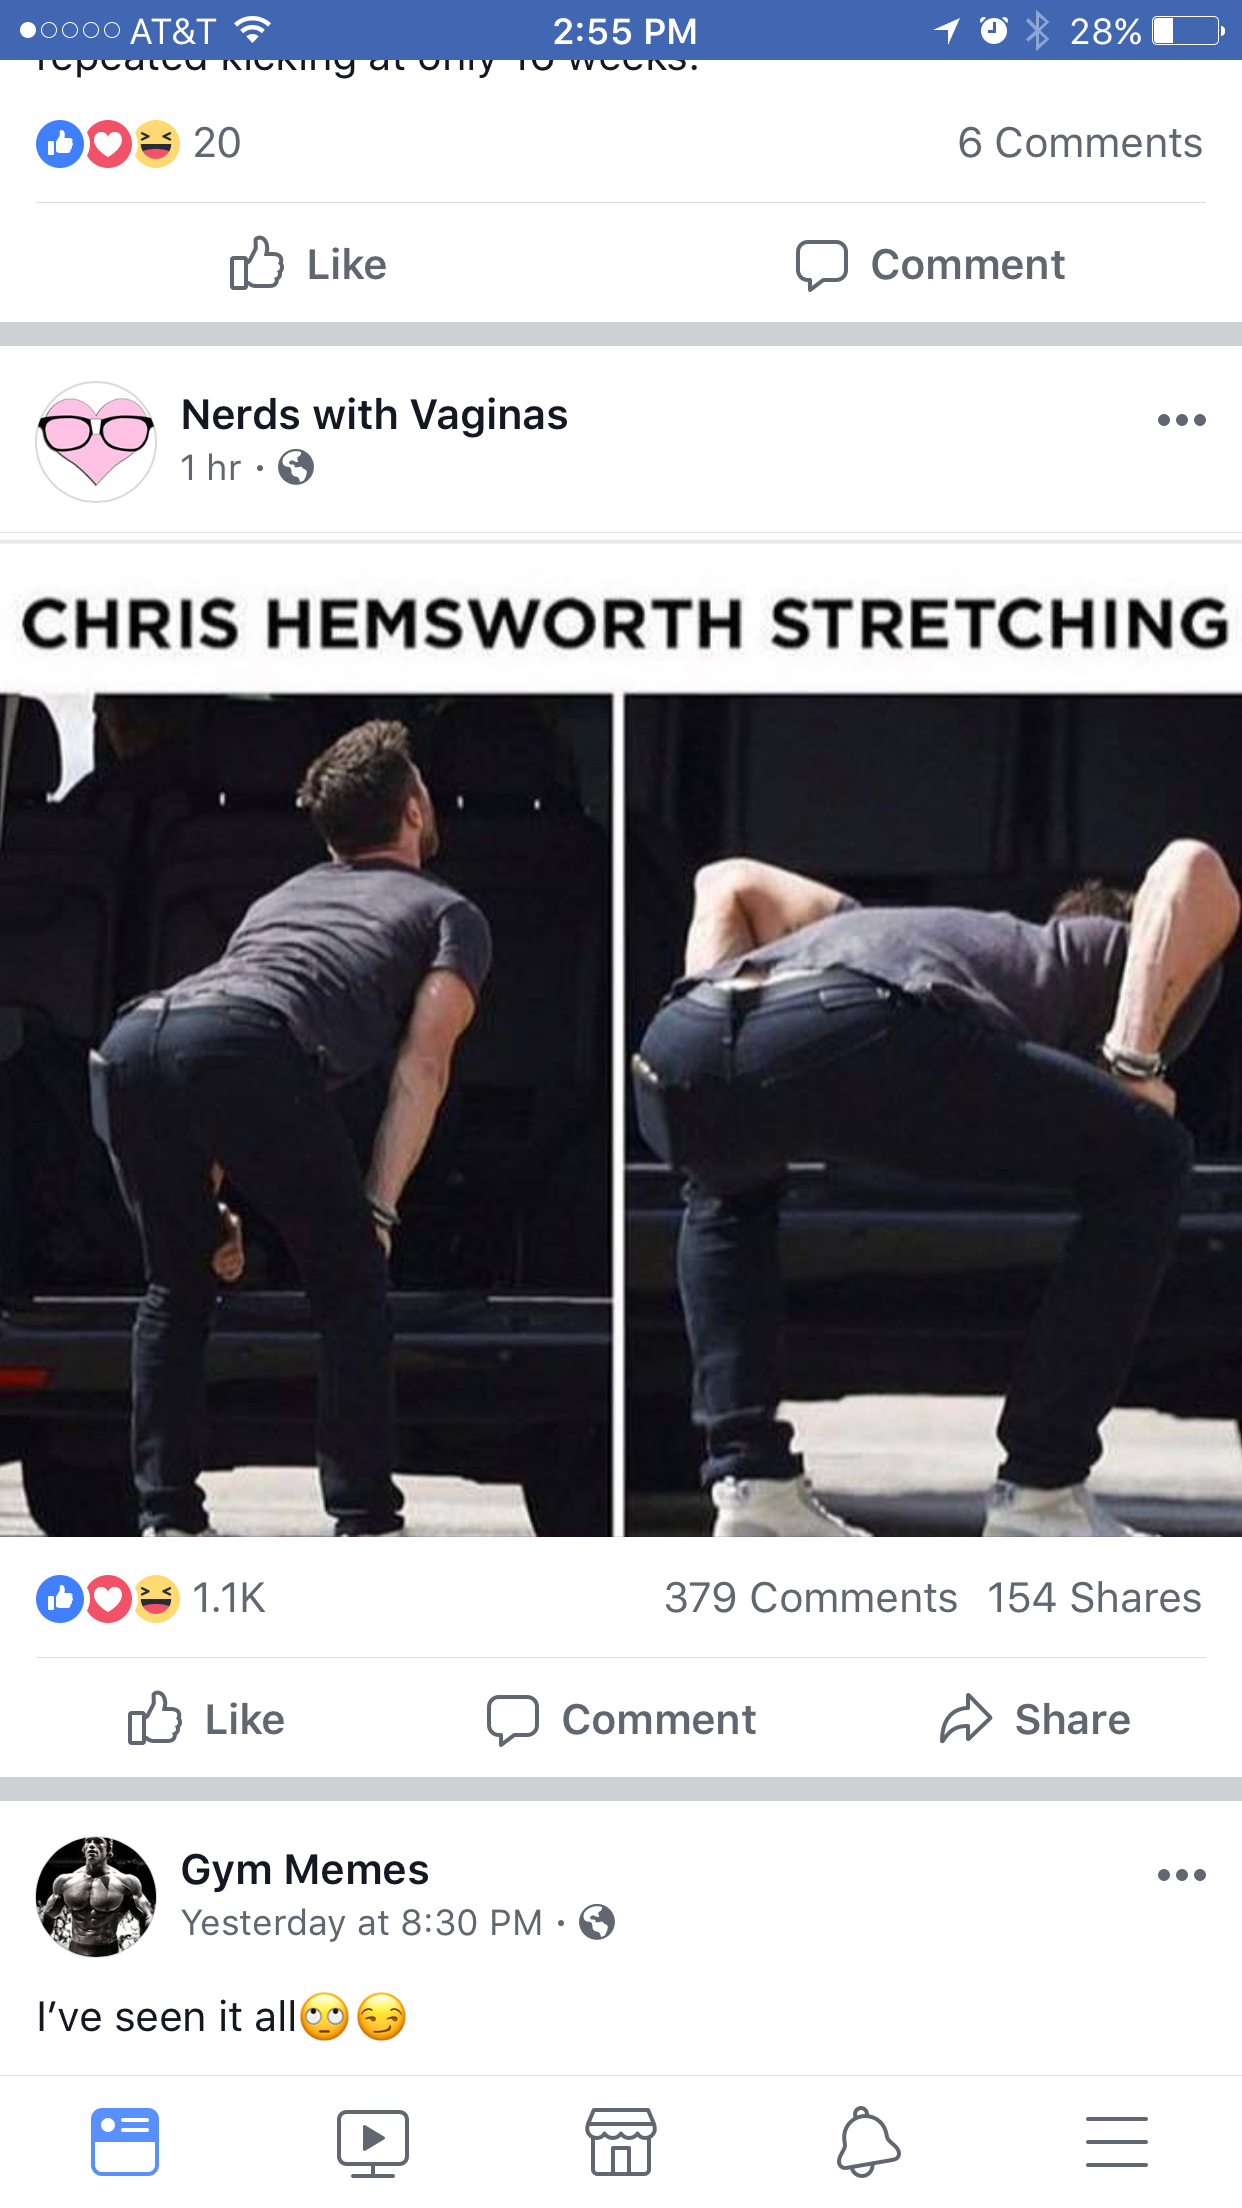 Pin by Jennifer De Ranieri on Funny | Chris hemsworth, Gym ...